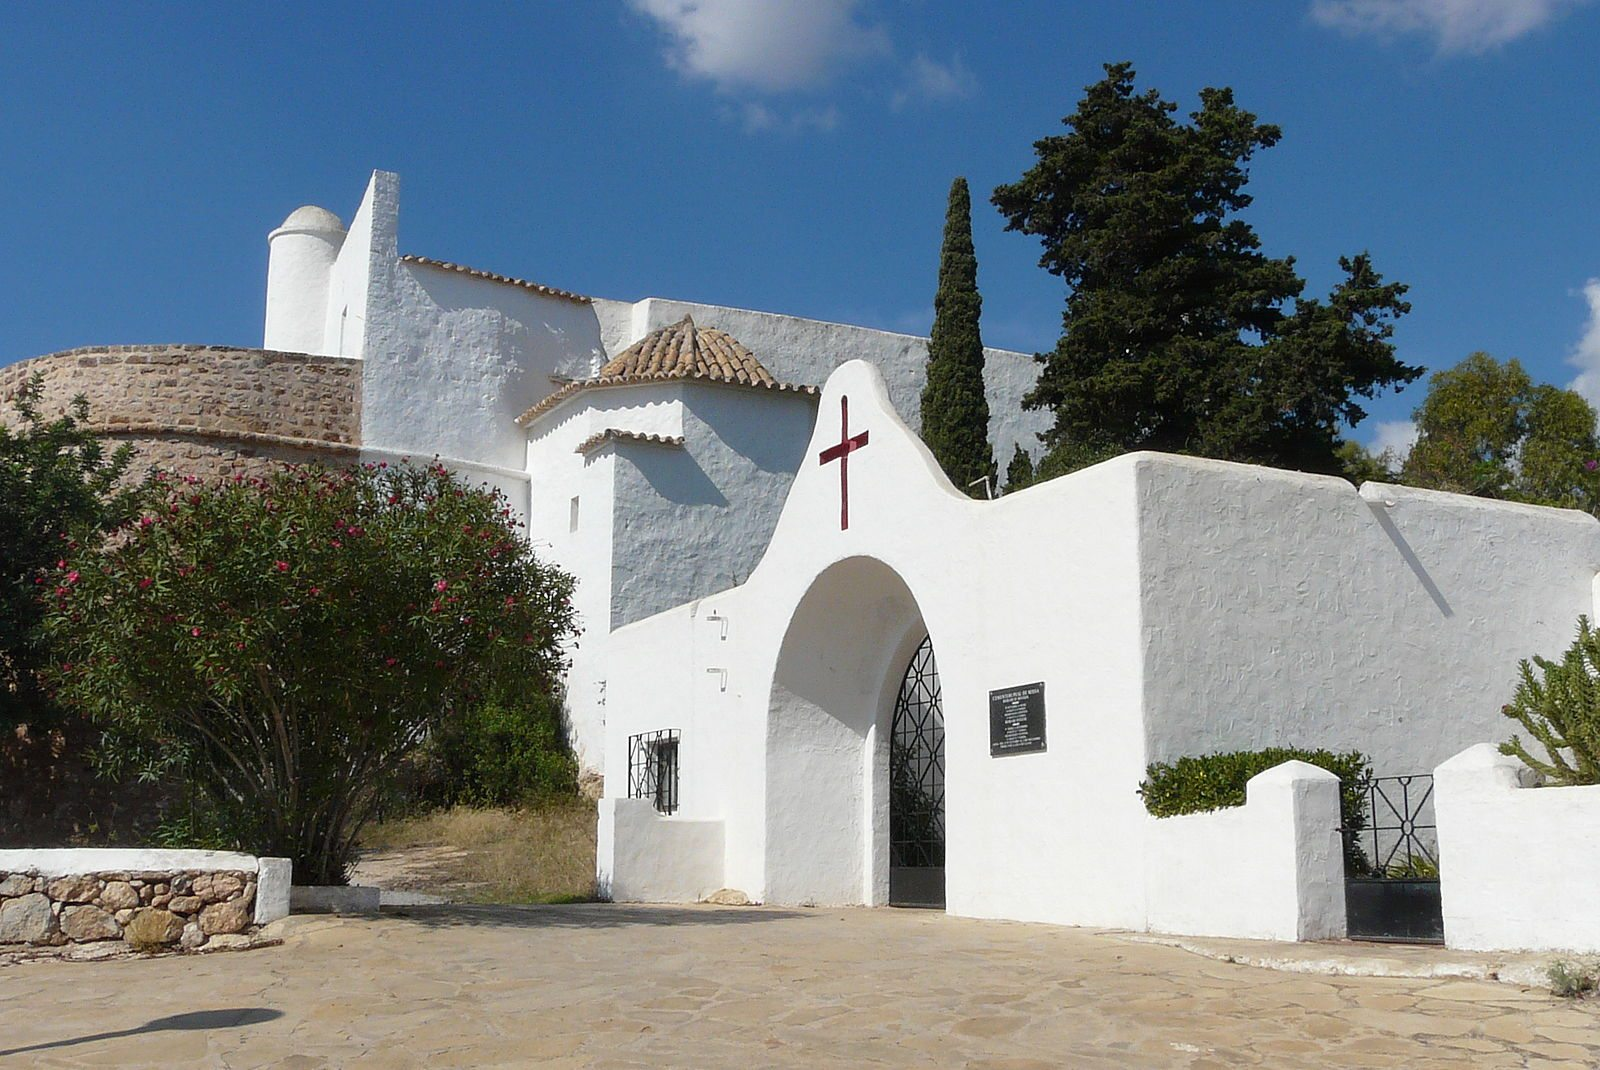 Puig de Missa church at Santa Eulalia